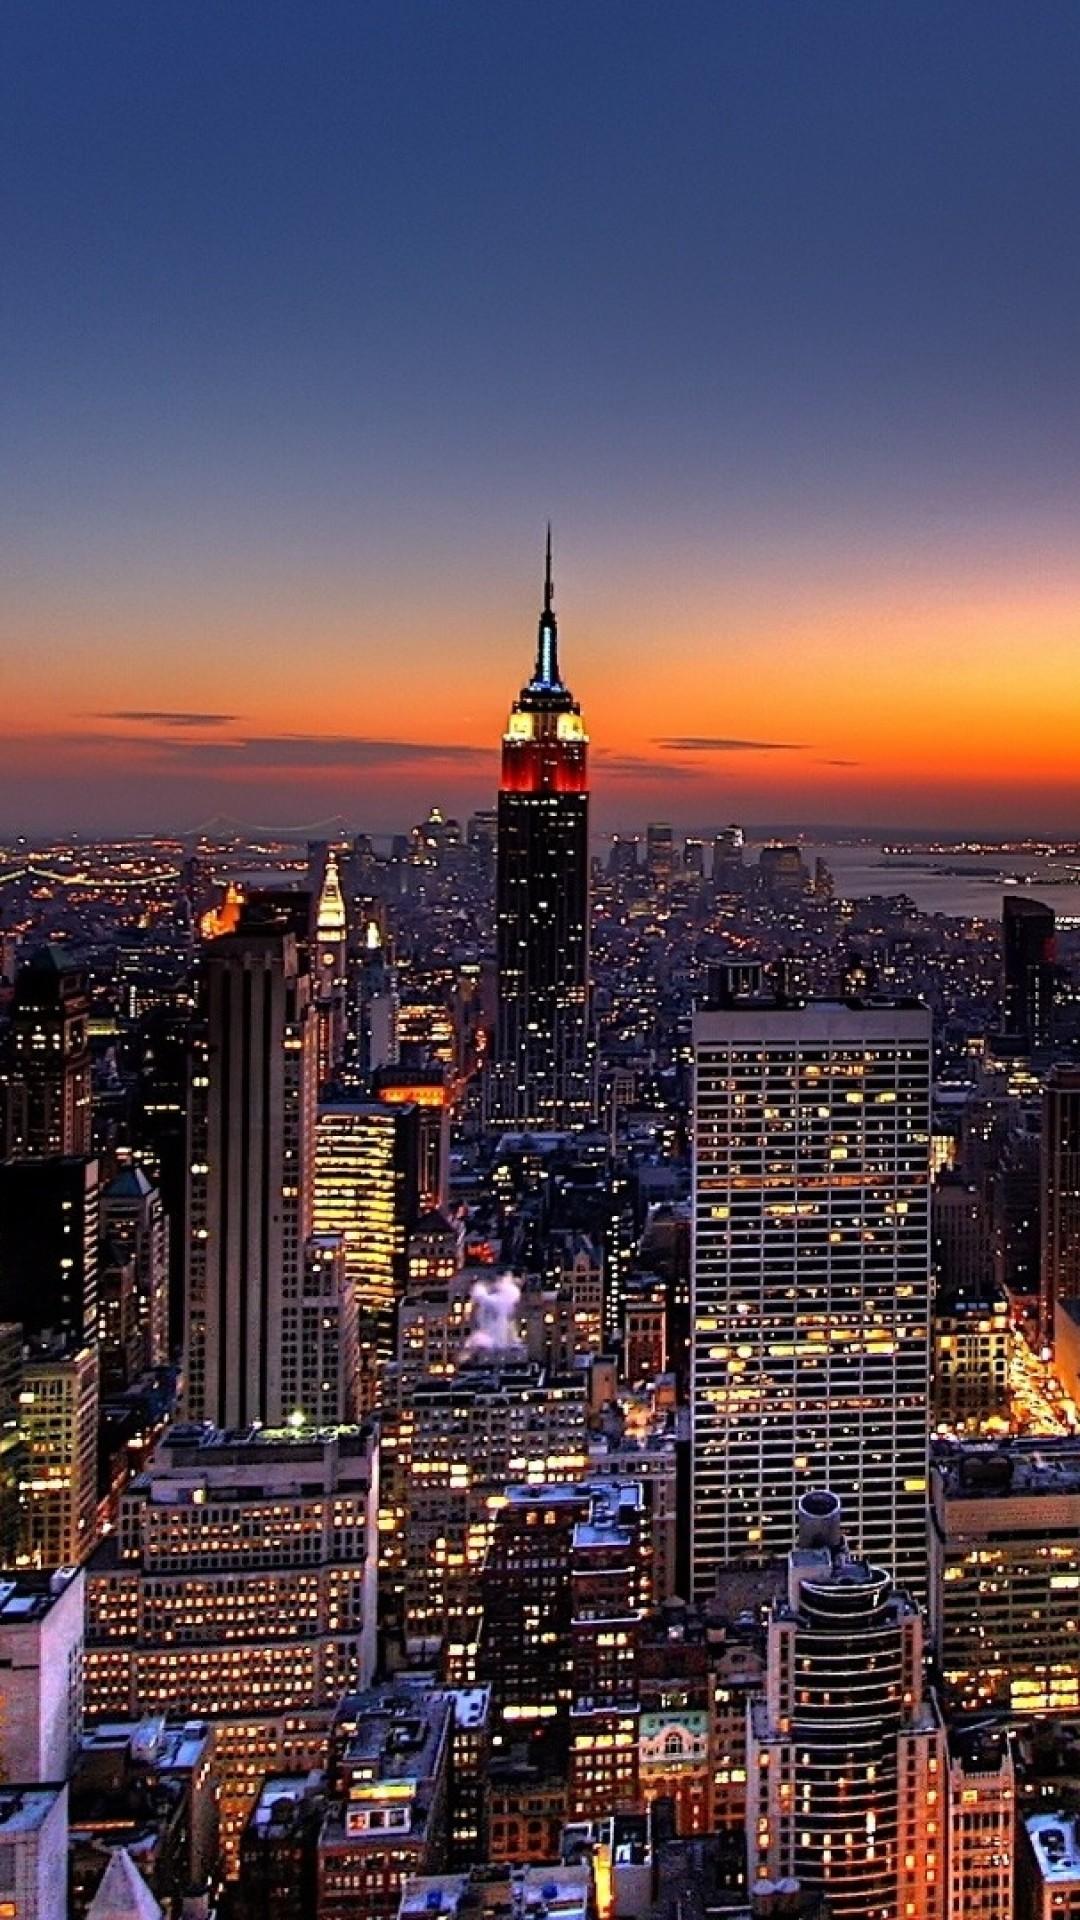 New York Yankees Wallpaper For Iphone 5 New York Skyline Wallpaper 58 Images